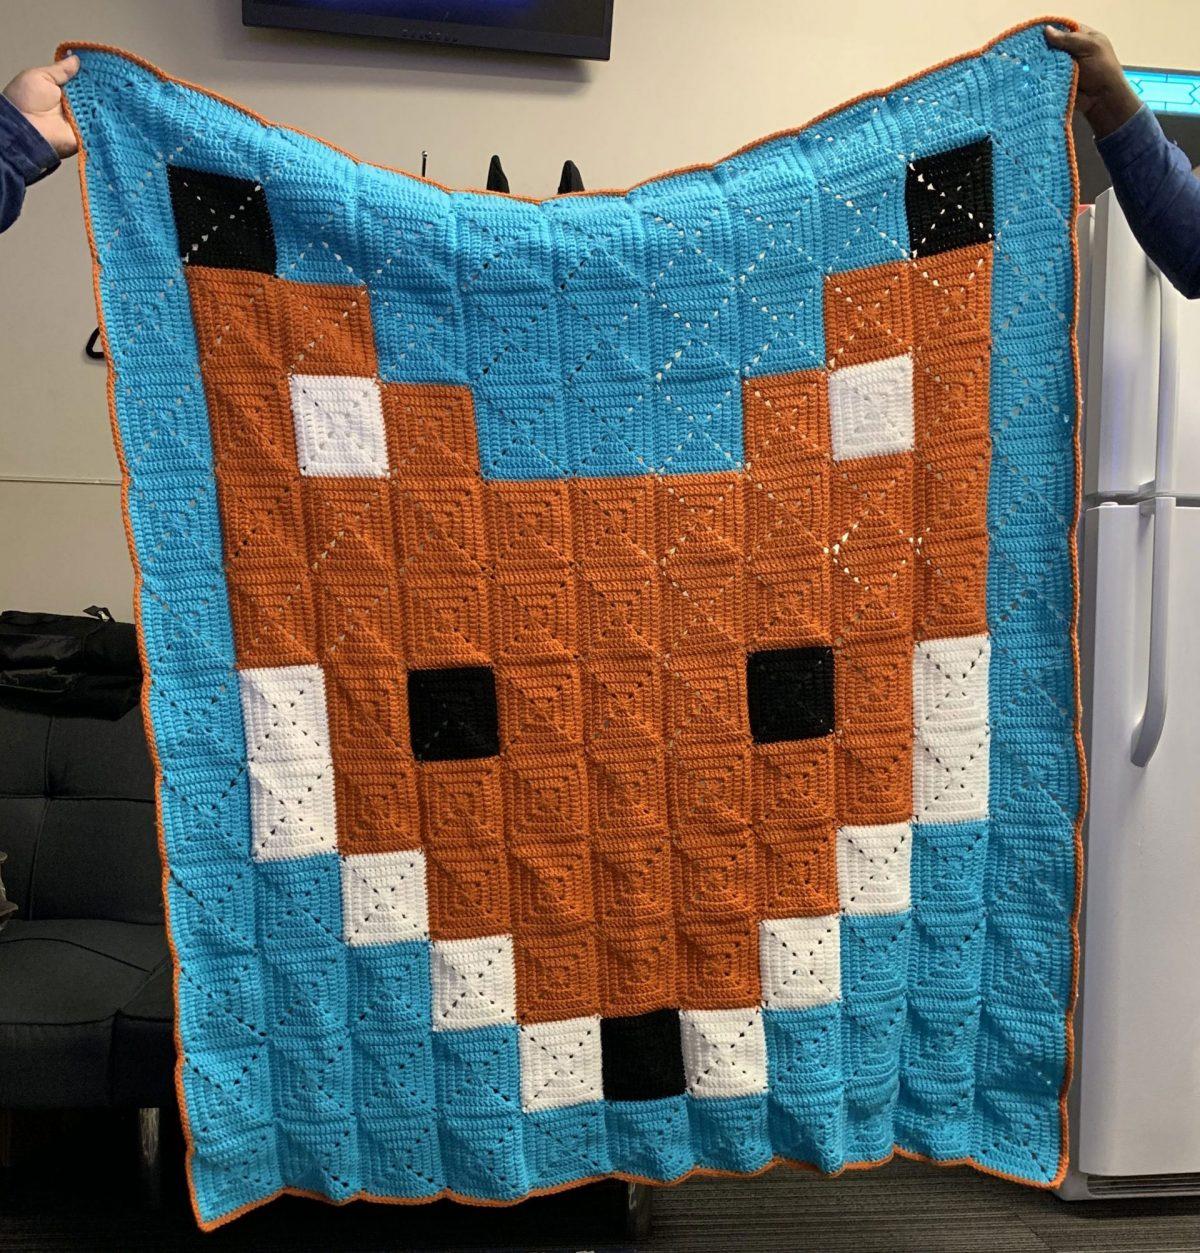 Ashley Valdez, Featured Crochet Hobbyist